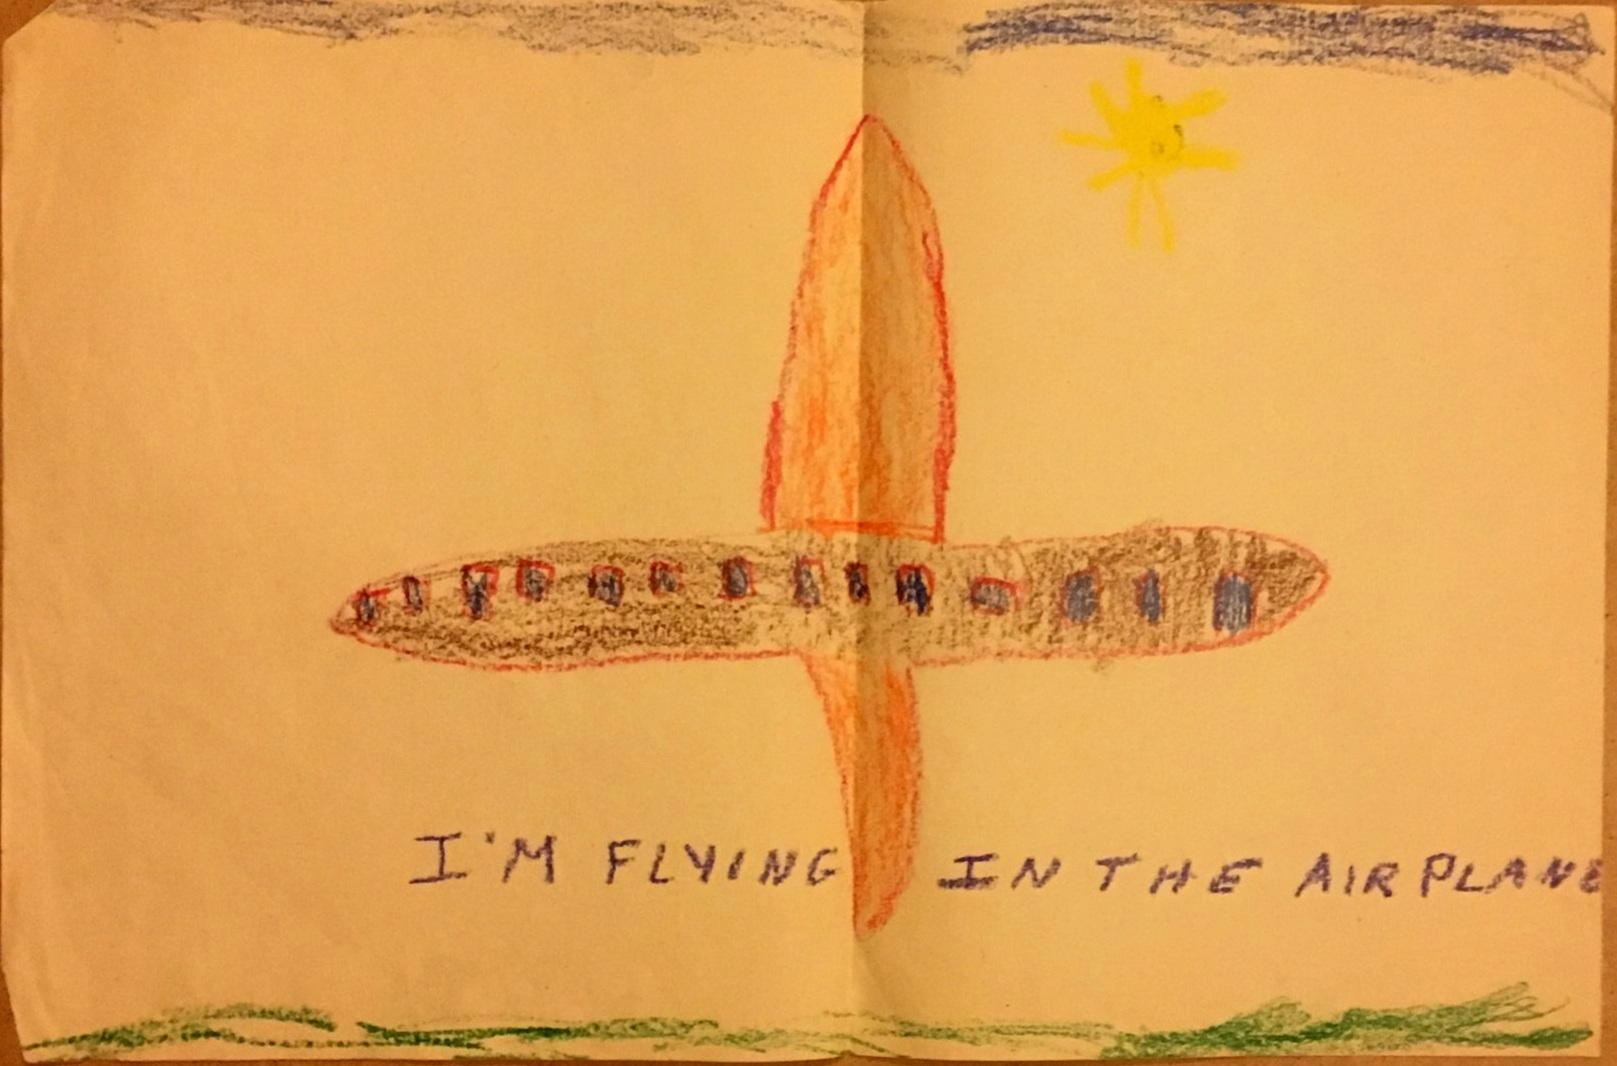 Justine's Kindergarten Airplane Drawing